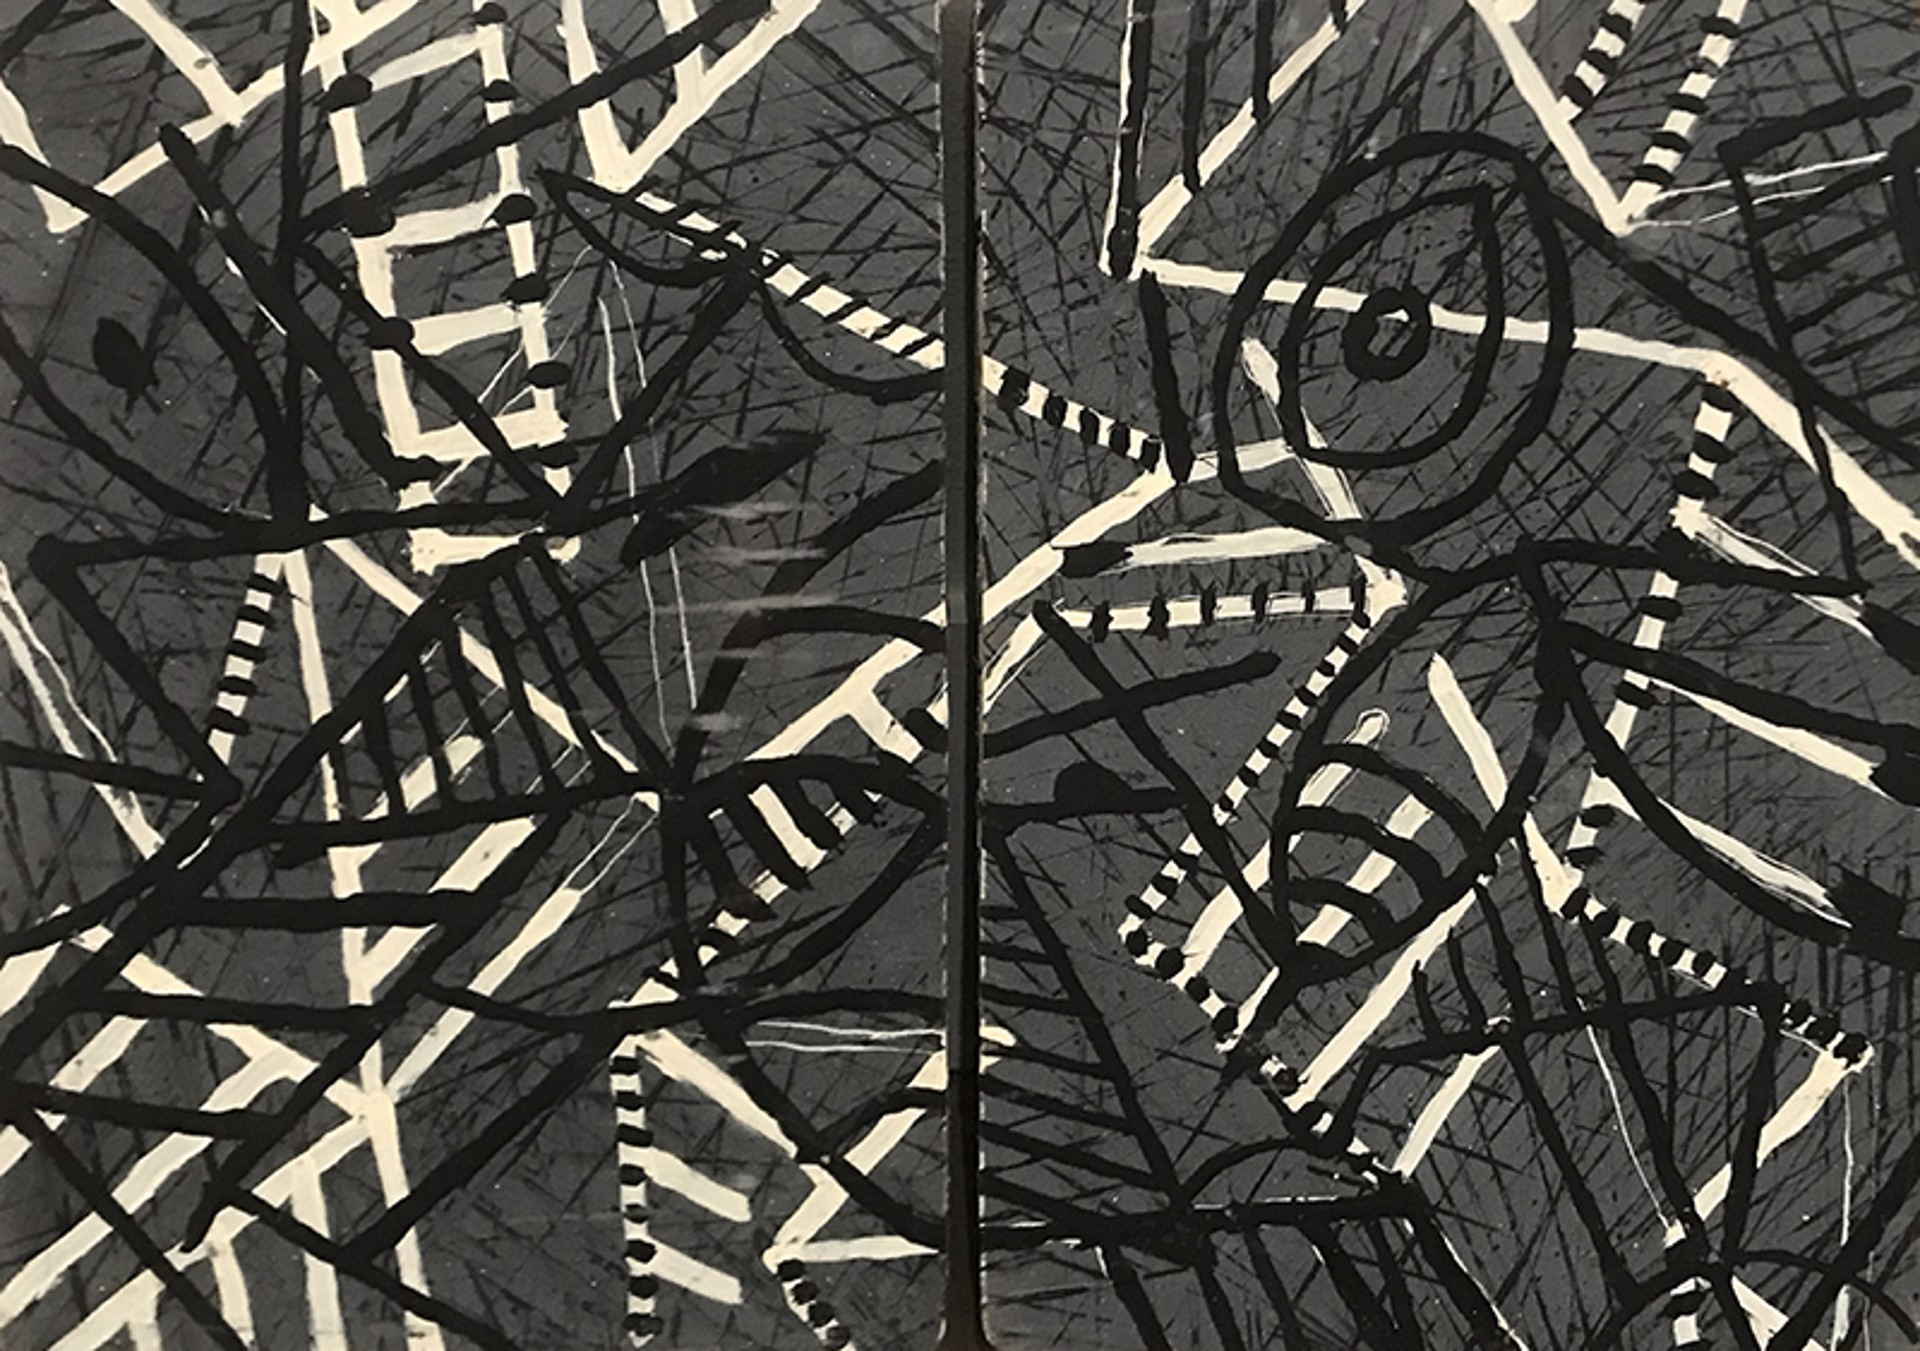 Untitled Diptych by Ibsen Espada